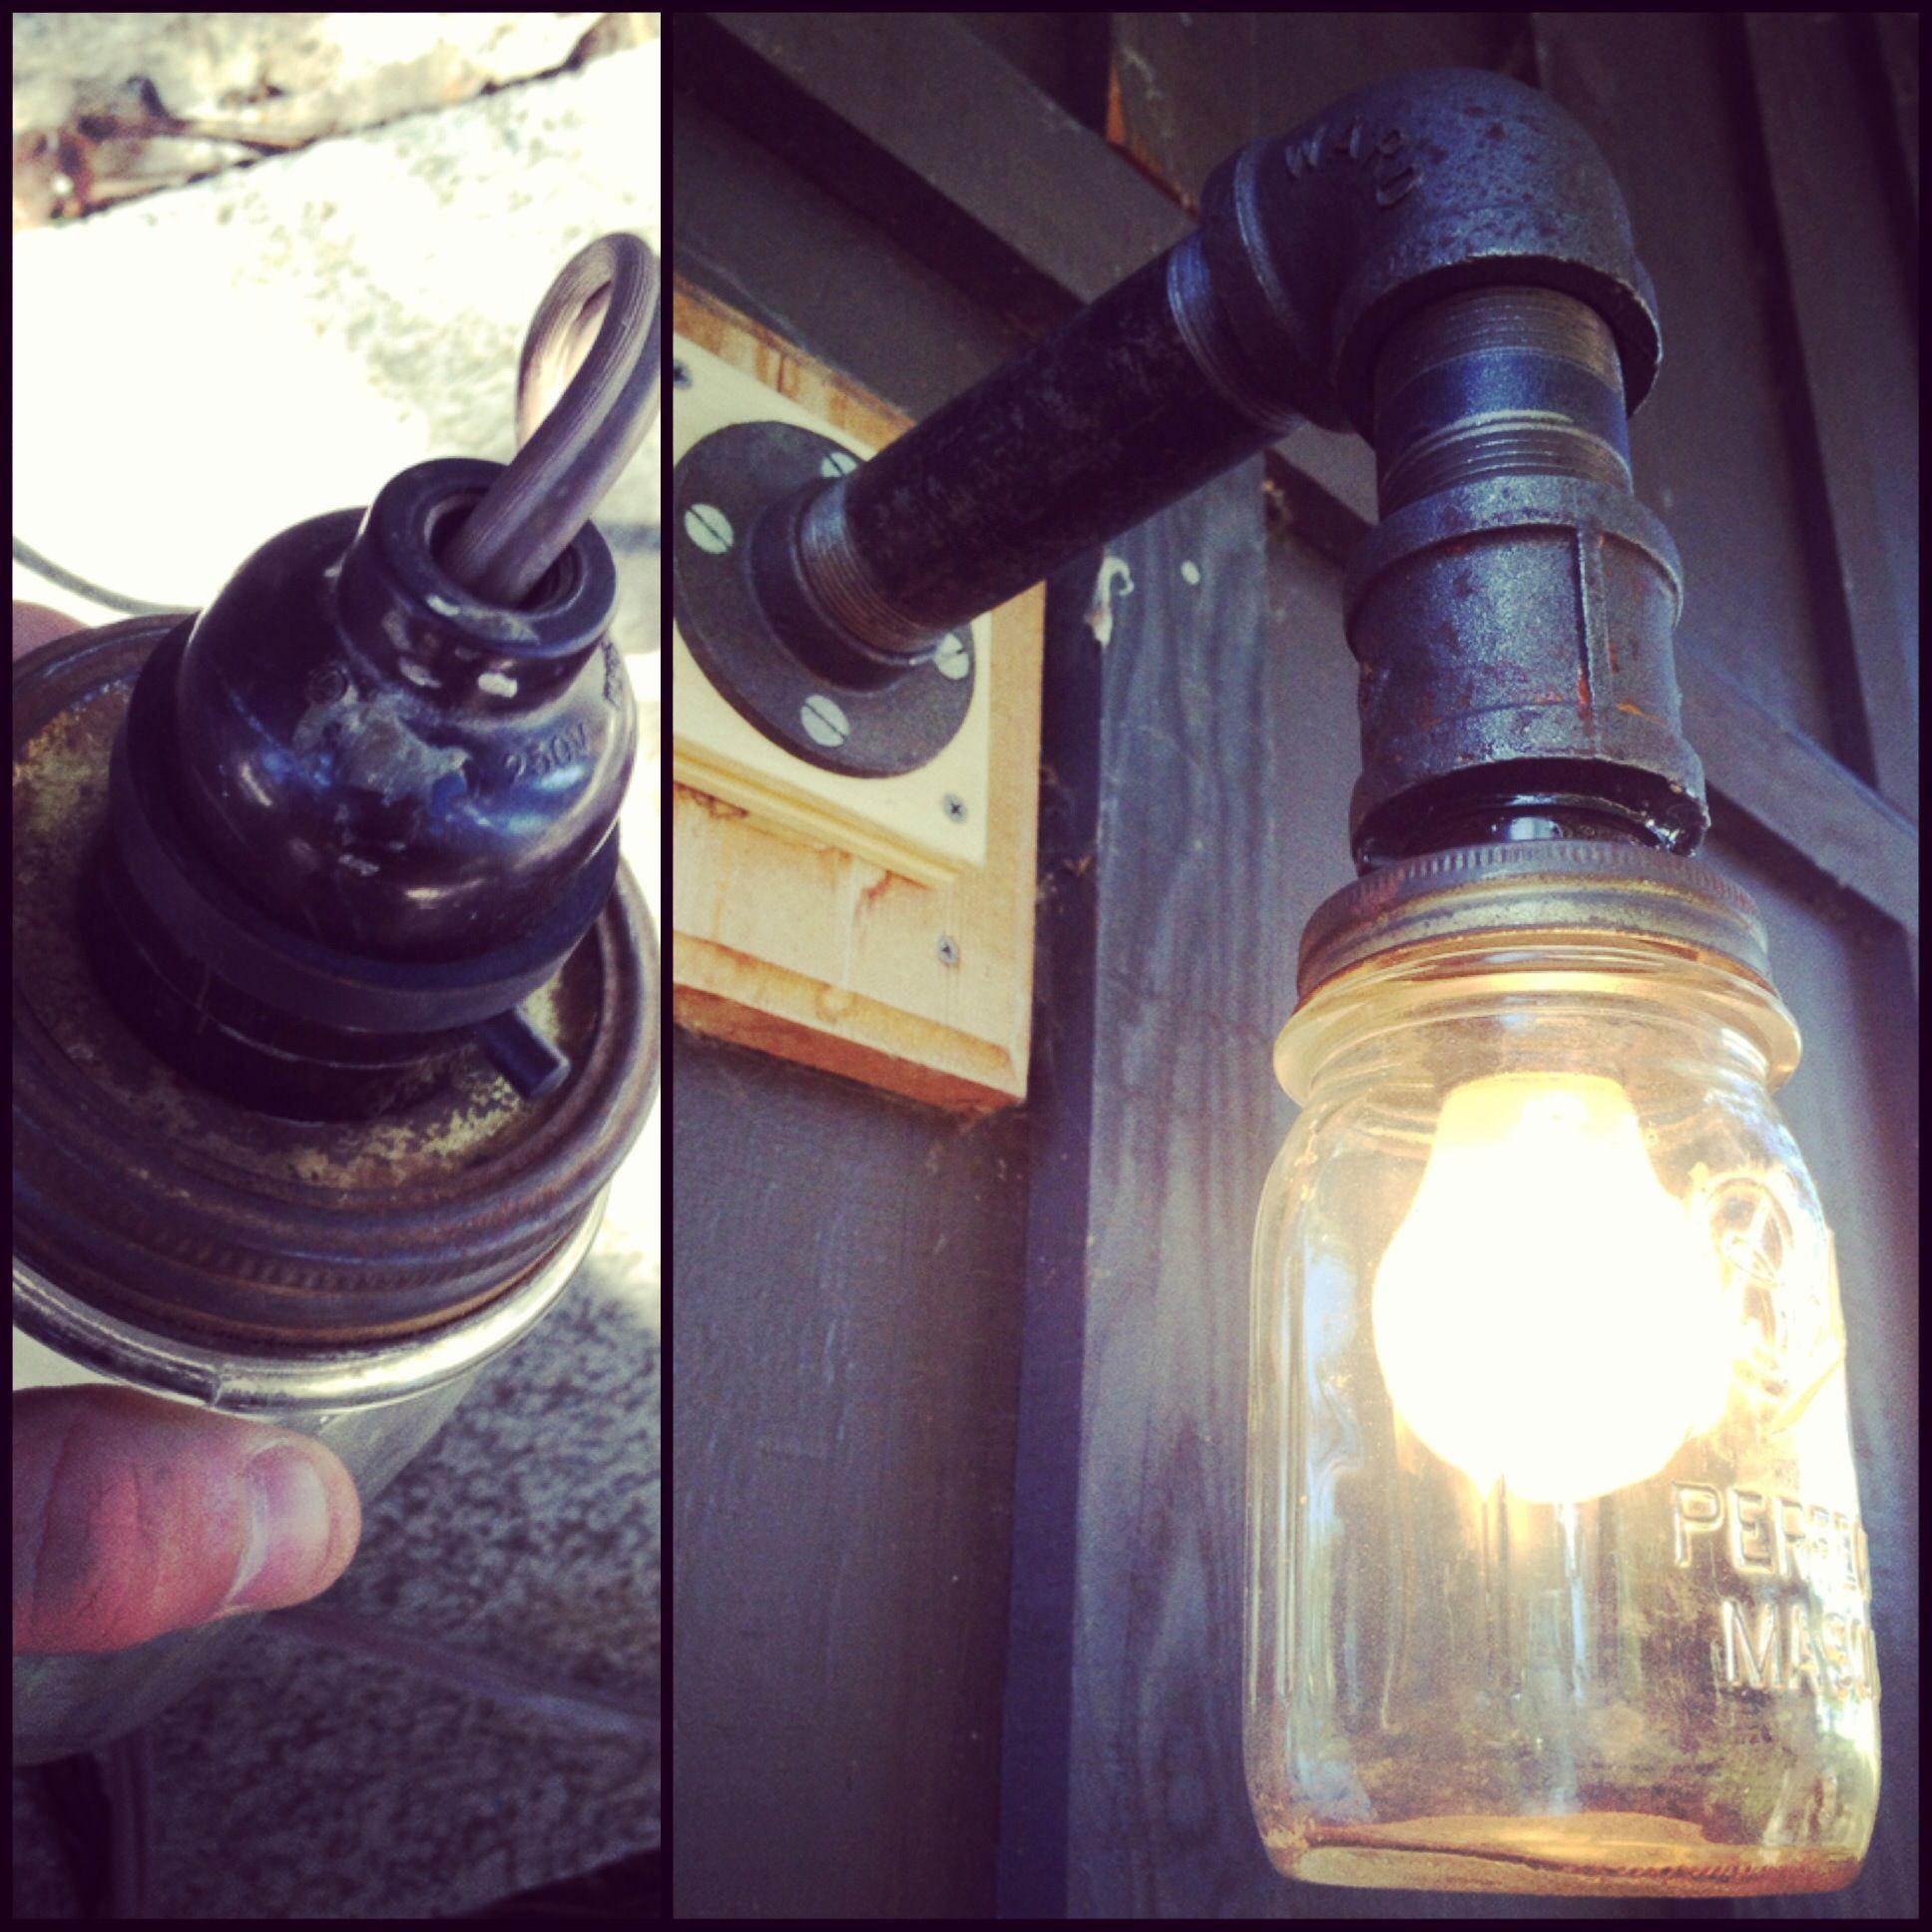 diy mason jar porch light black iron pipe for the arm diy home decor diy mason jar lights. Black Bedroom Furniture Sets. Home Design Ideas